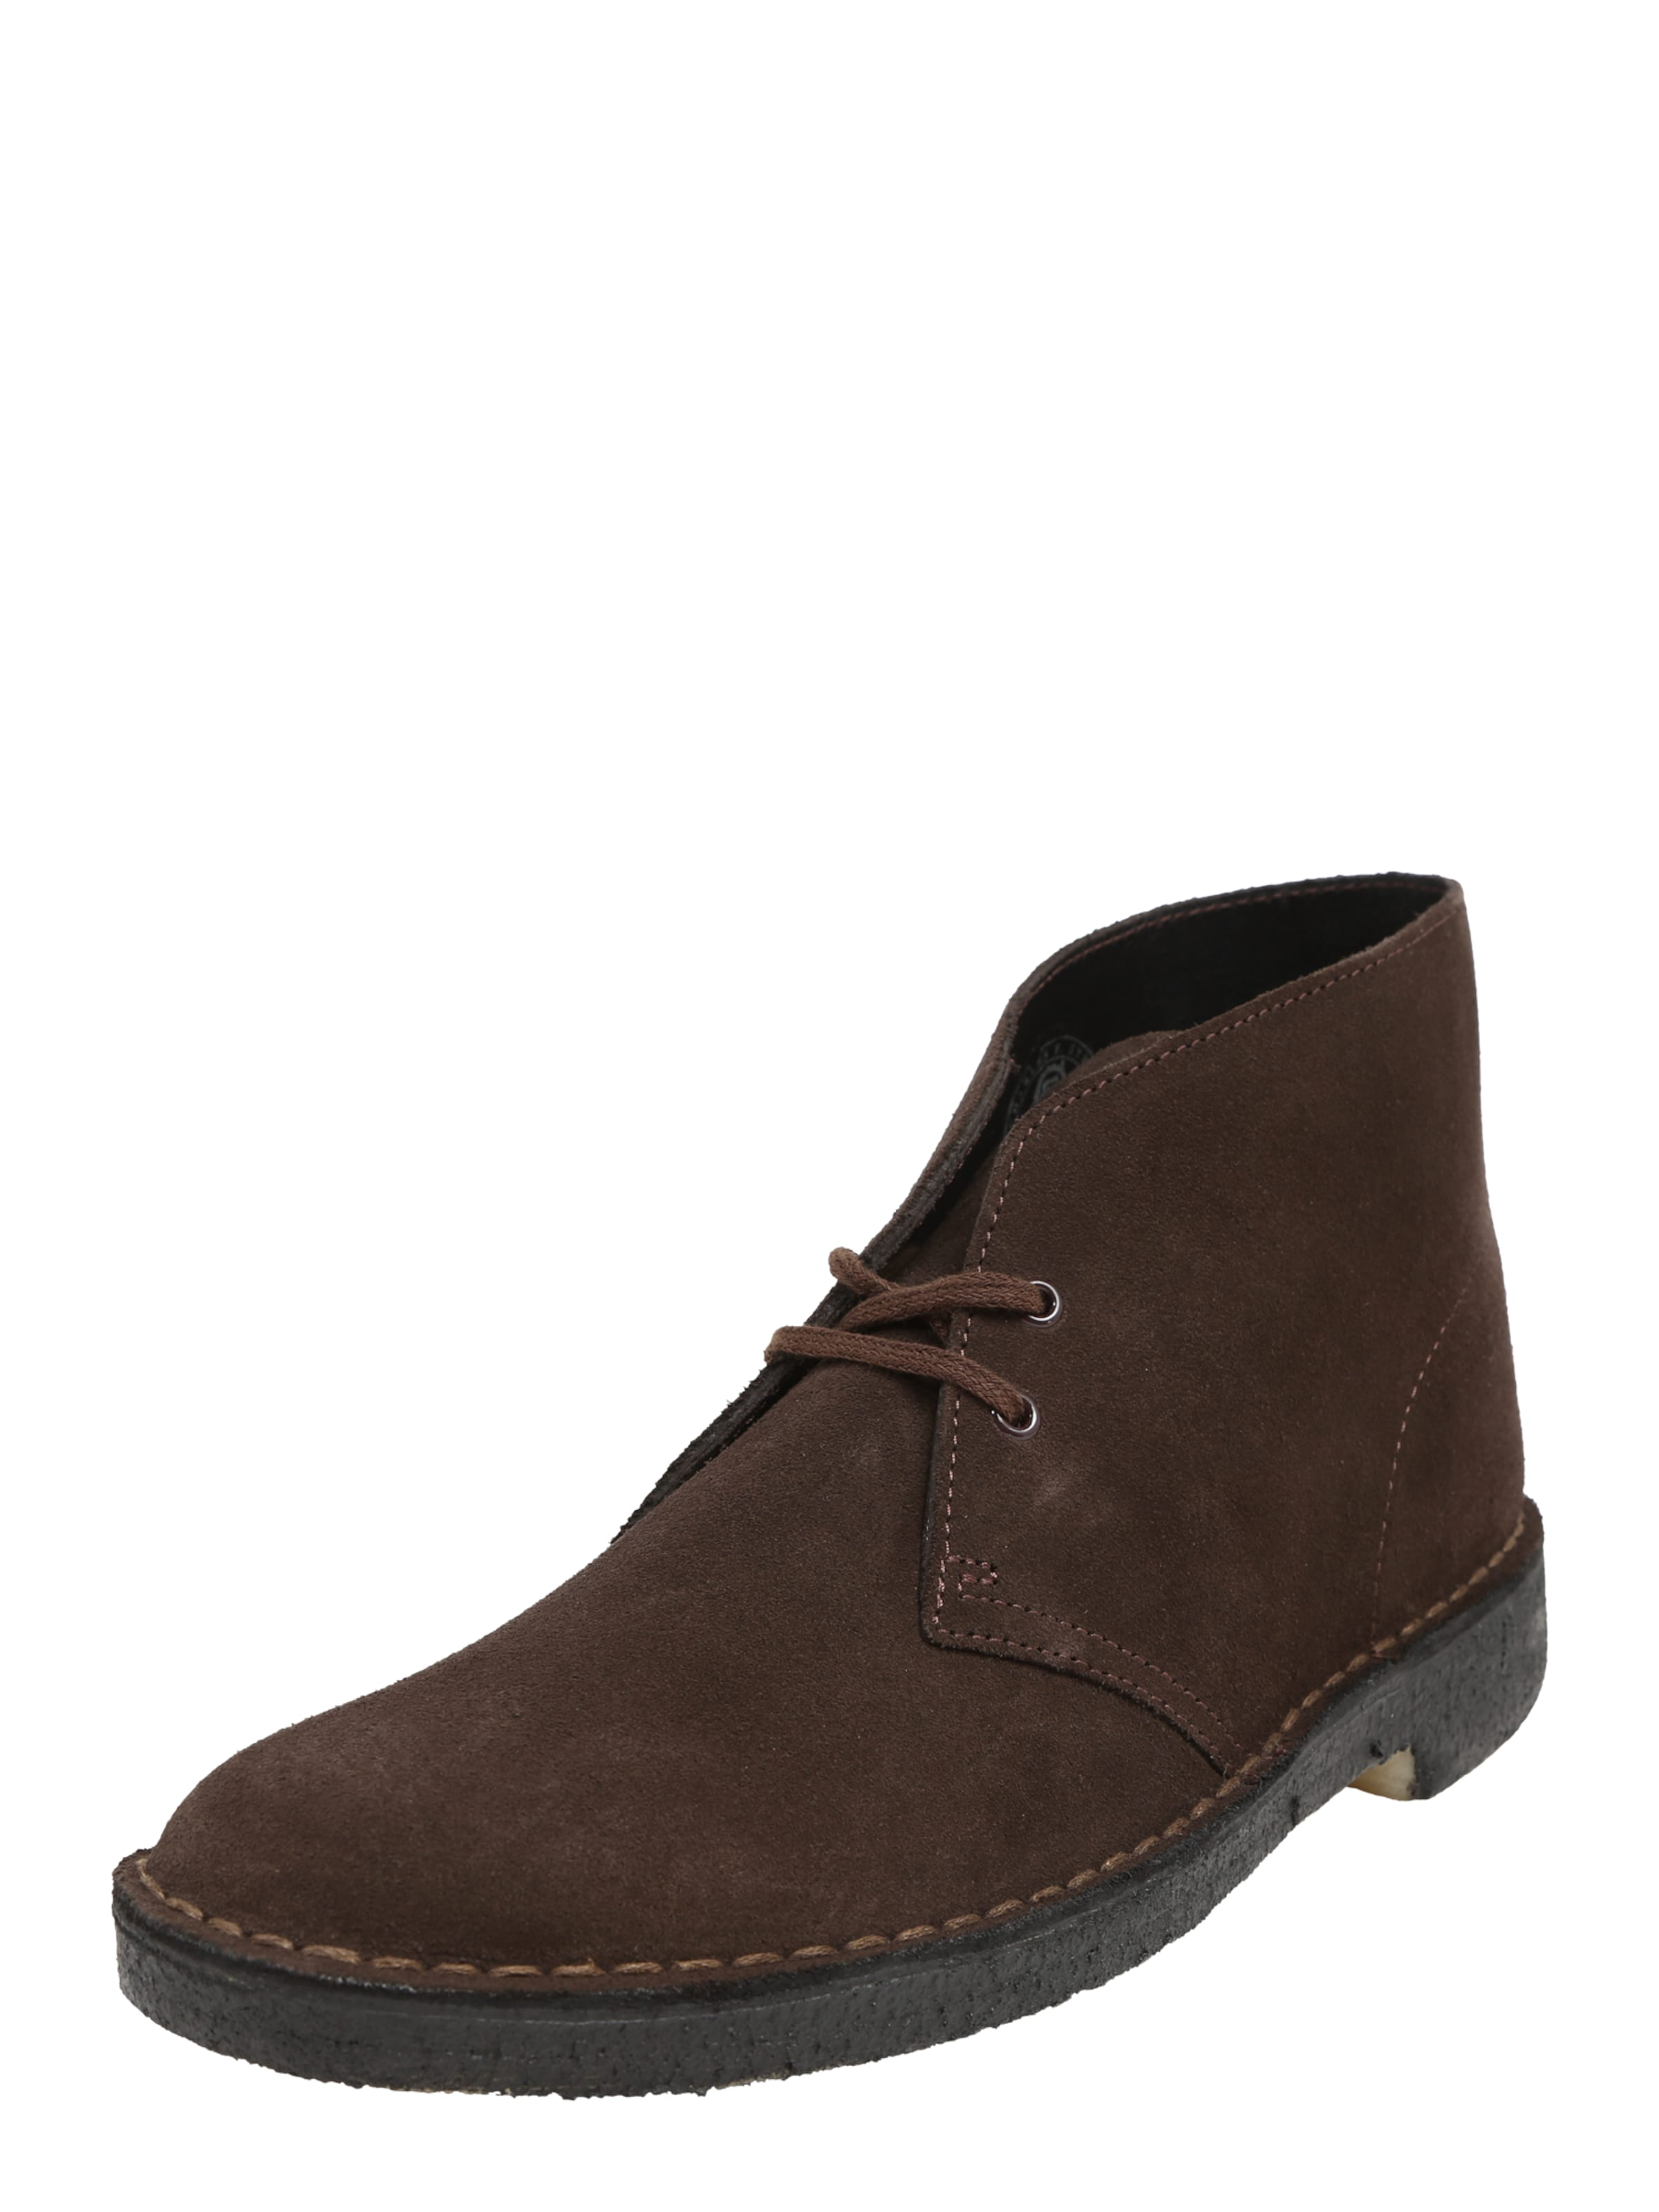 Originals Sand In Desert boots Clarks Tc3Kl1FJ